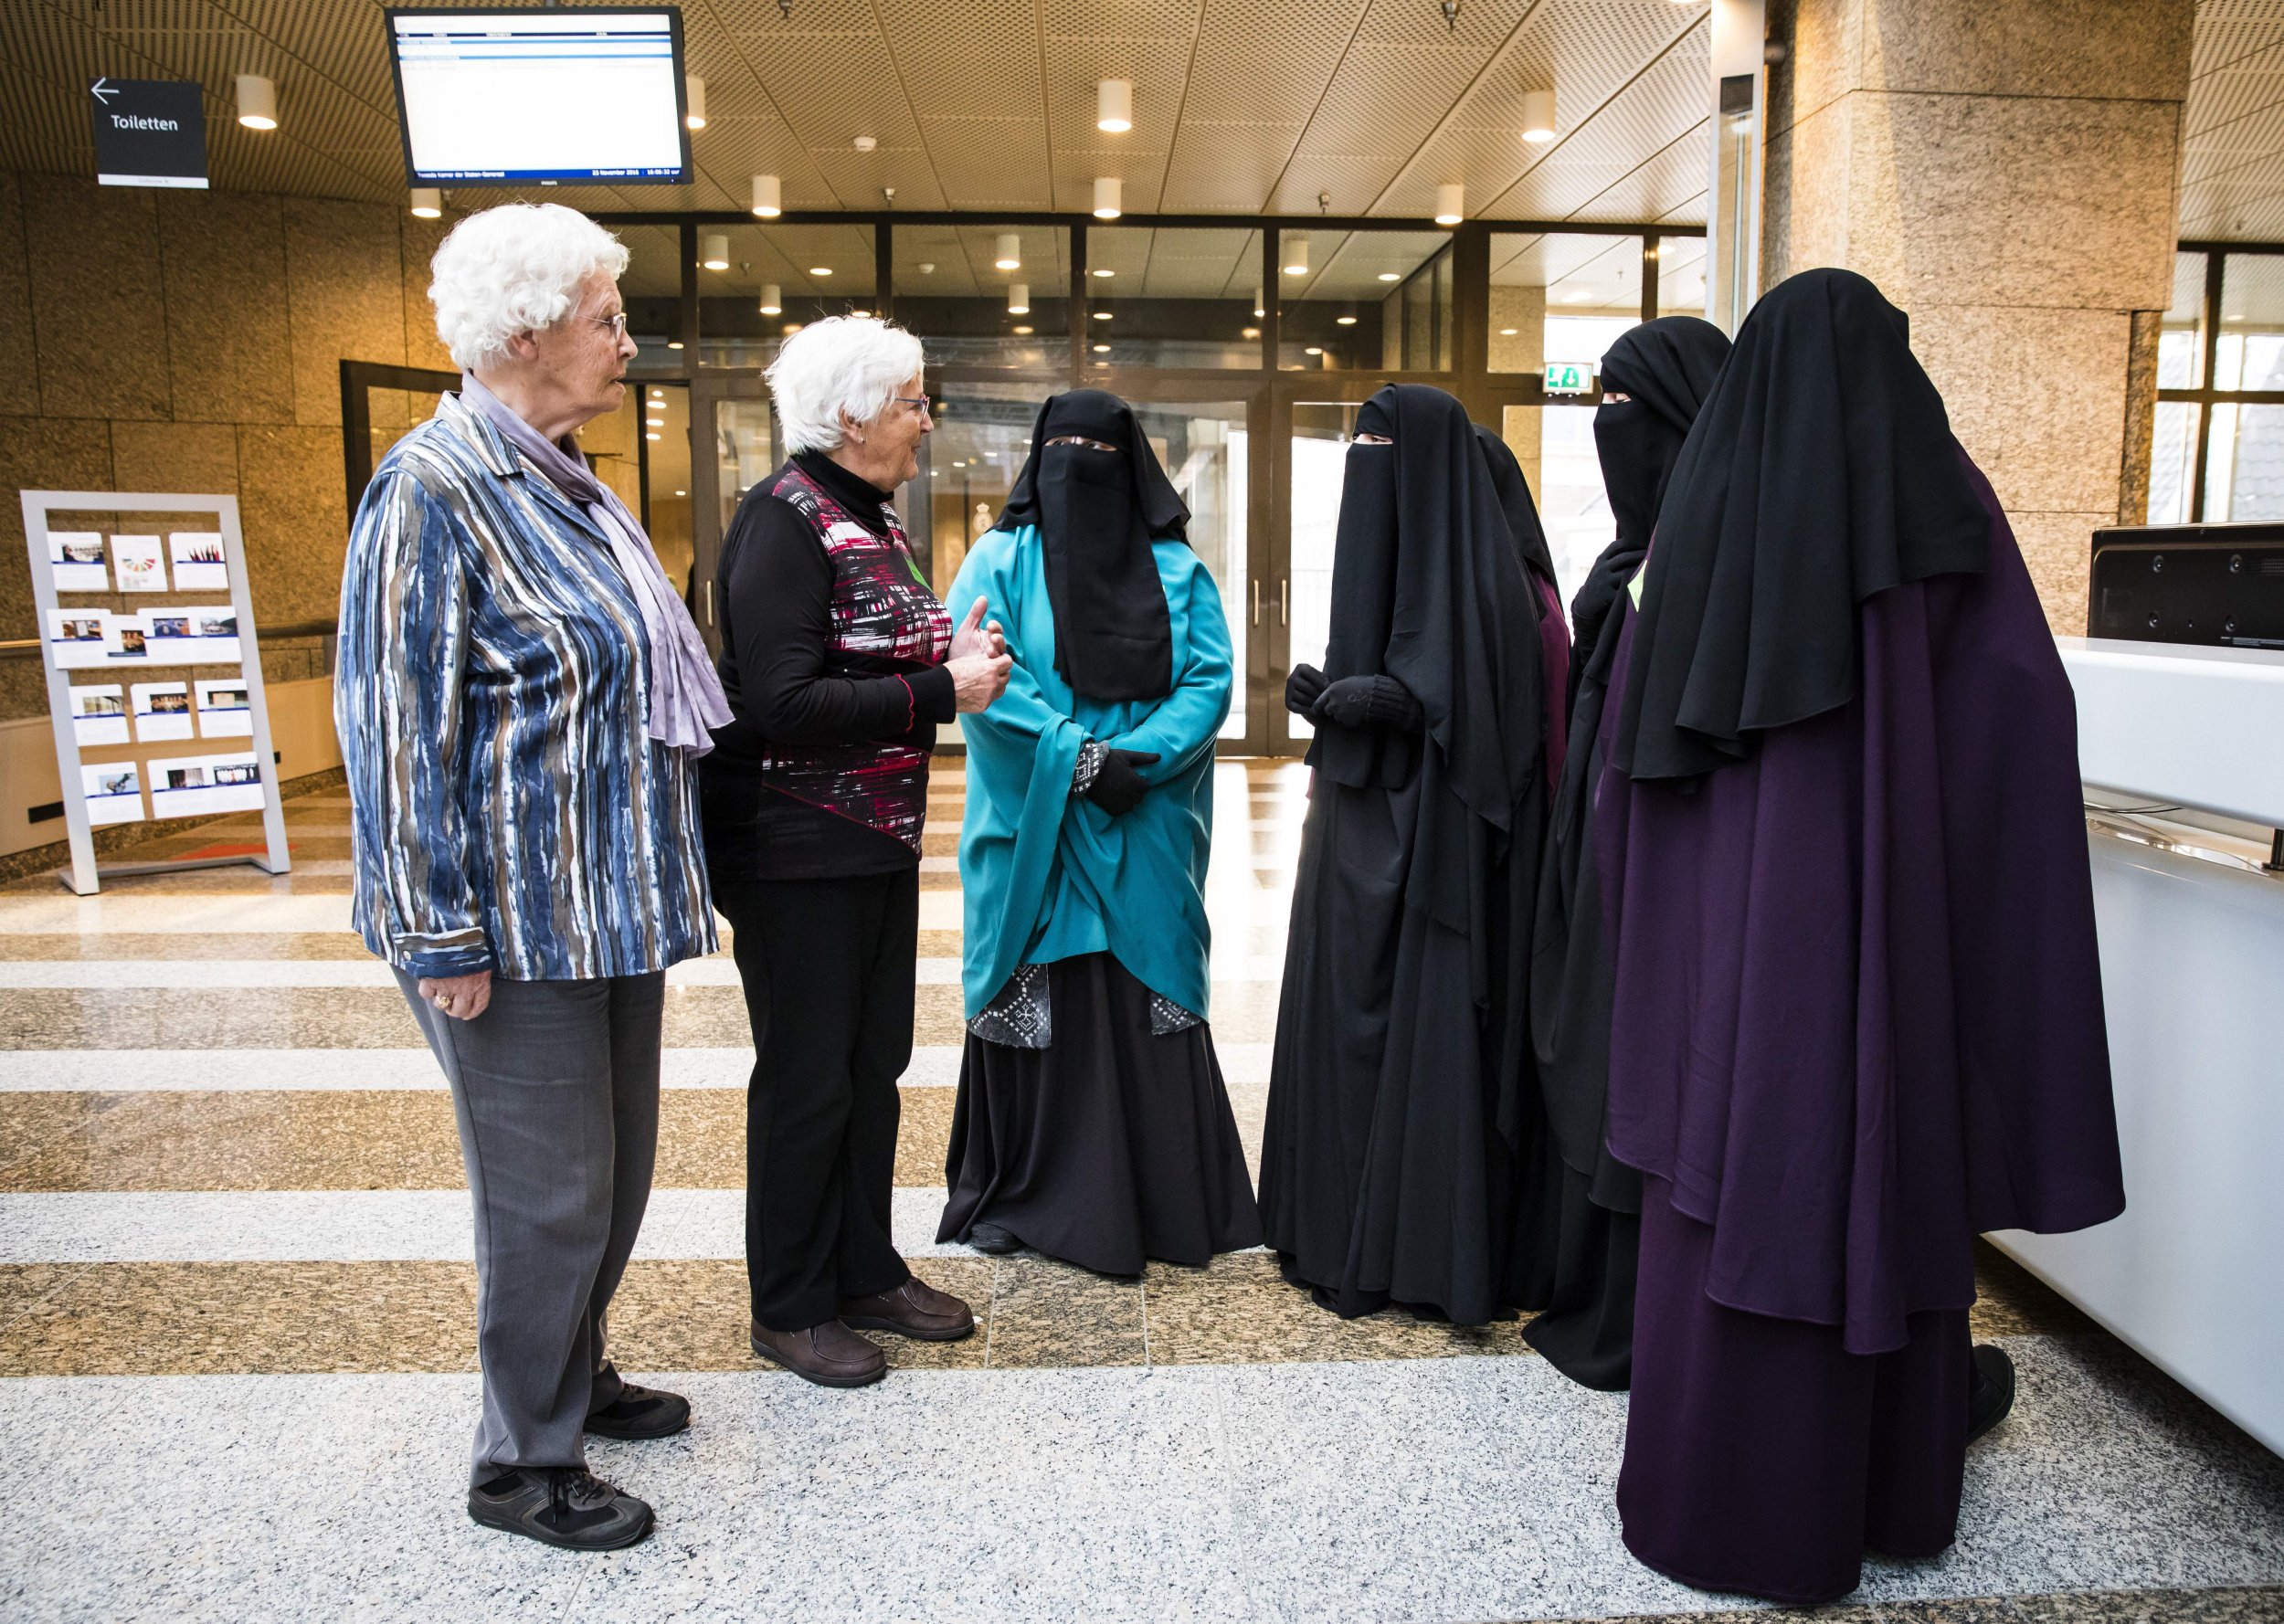 Women adorning the niqab attend the Dutch Senate